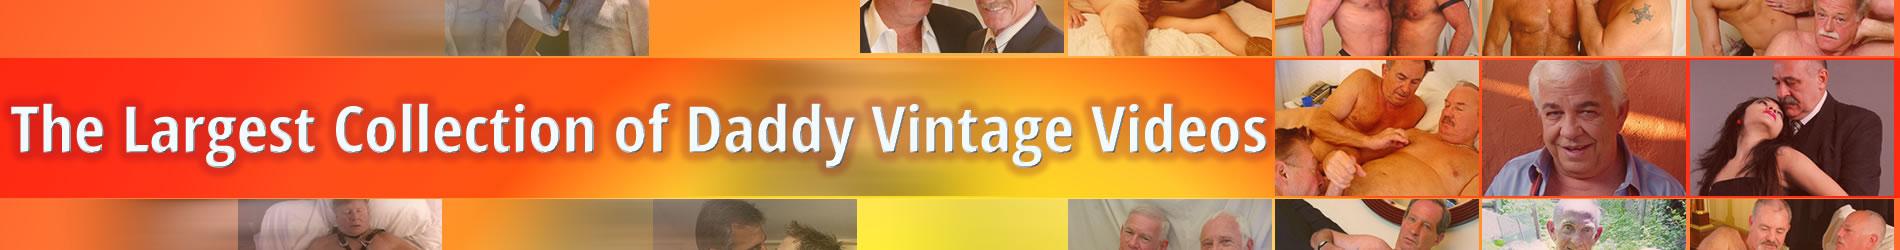 DaddyVintage.com Banner